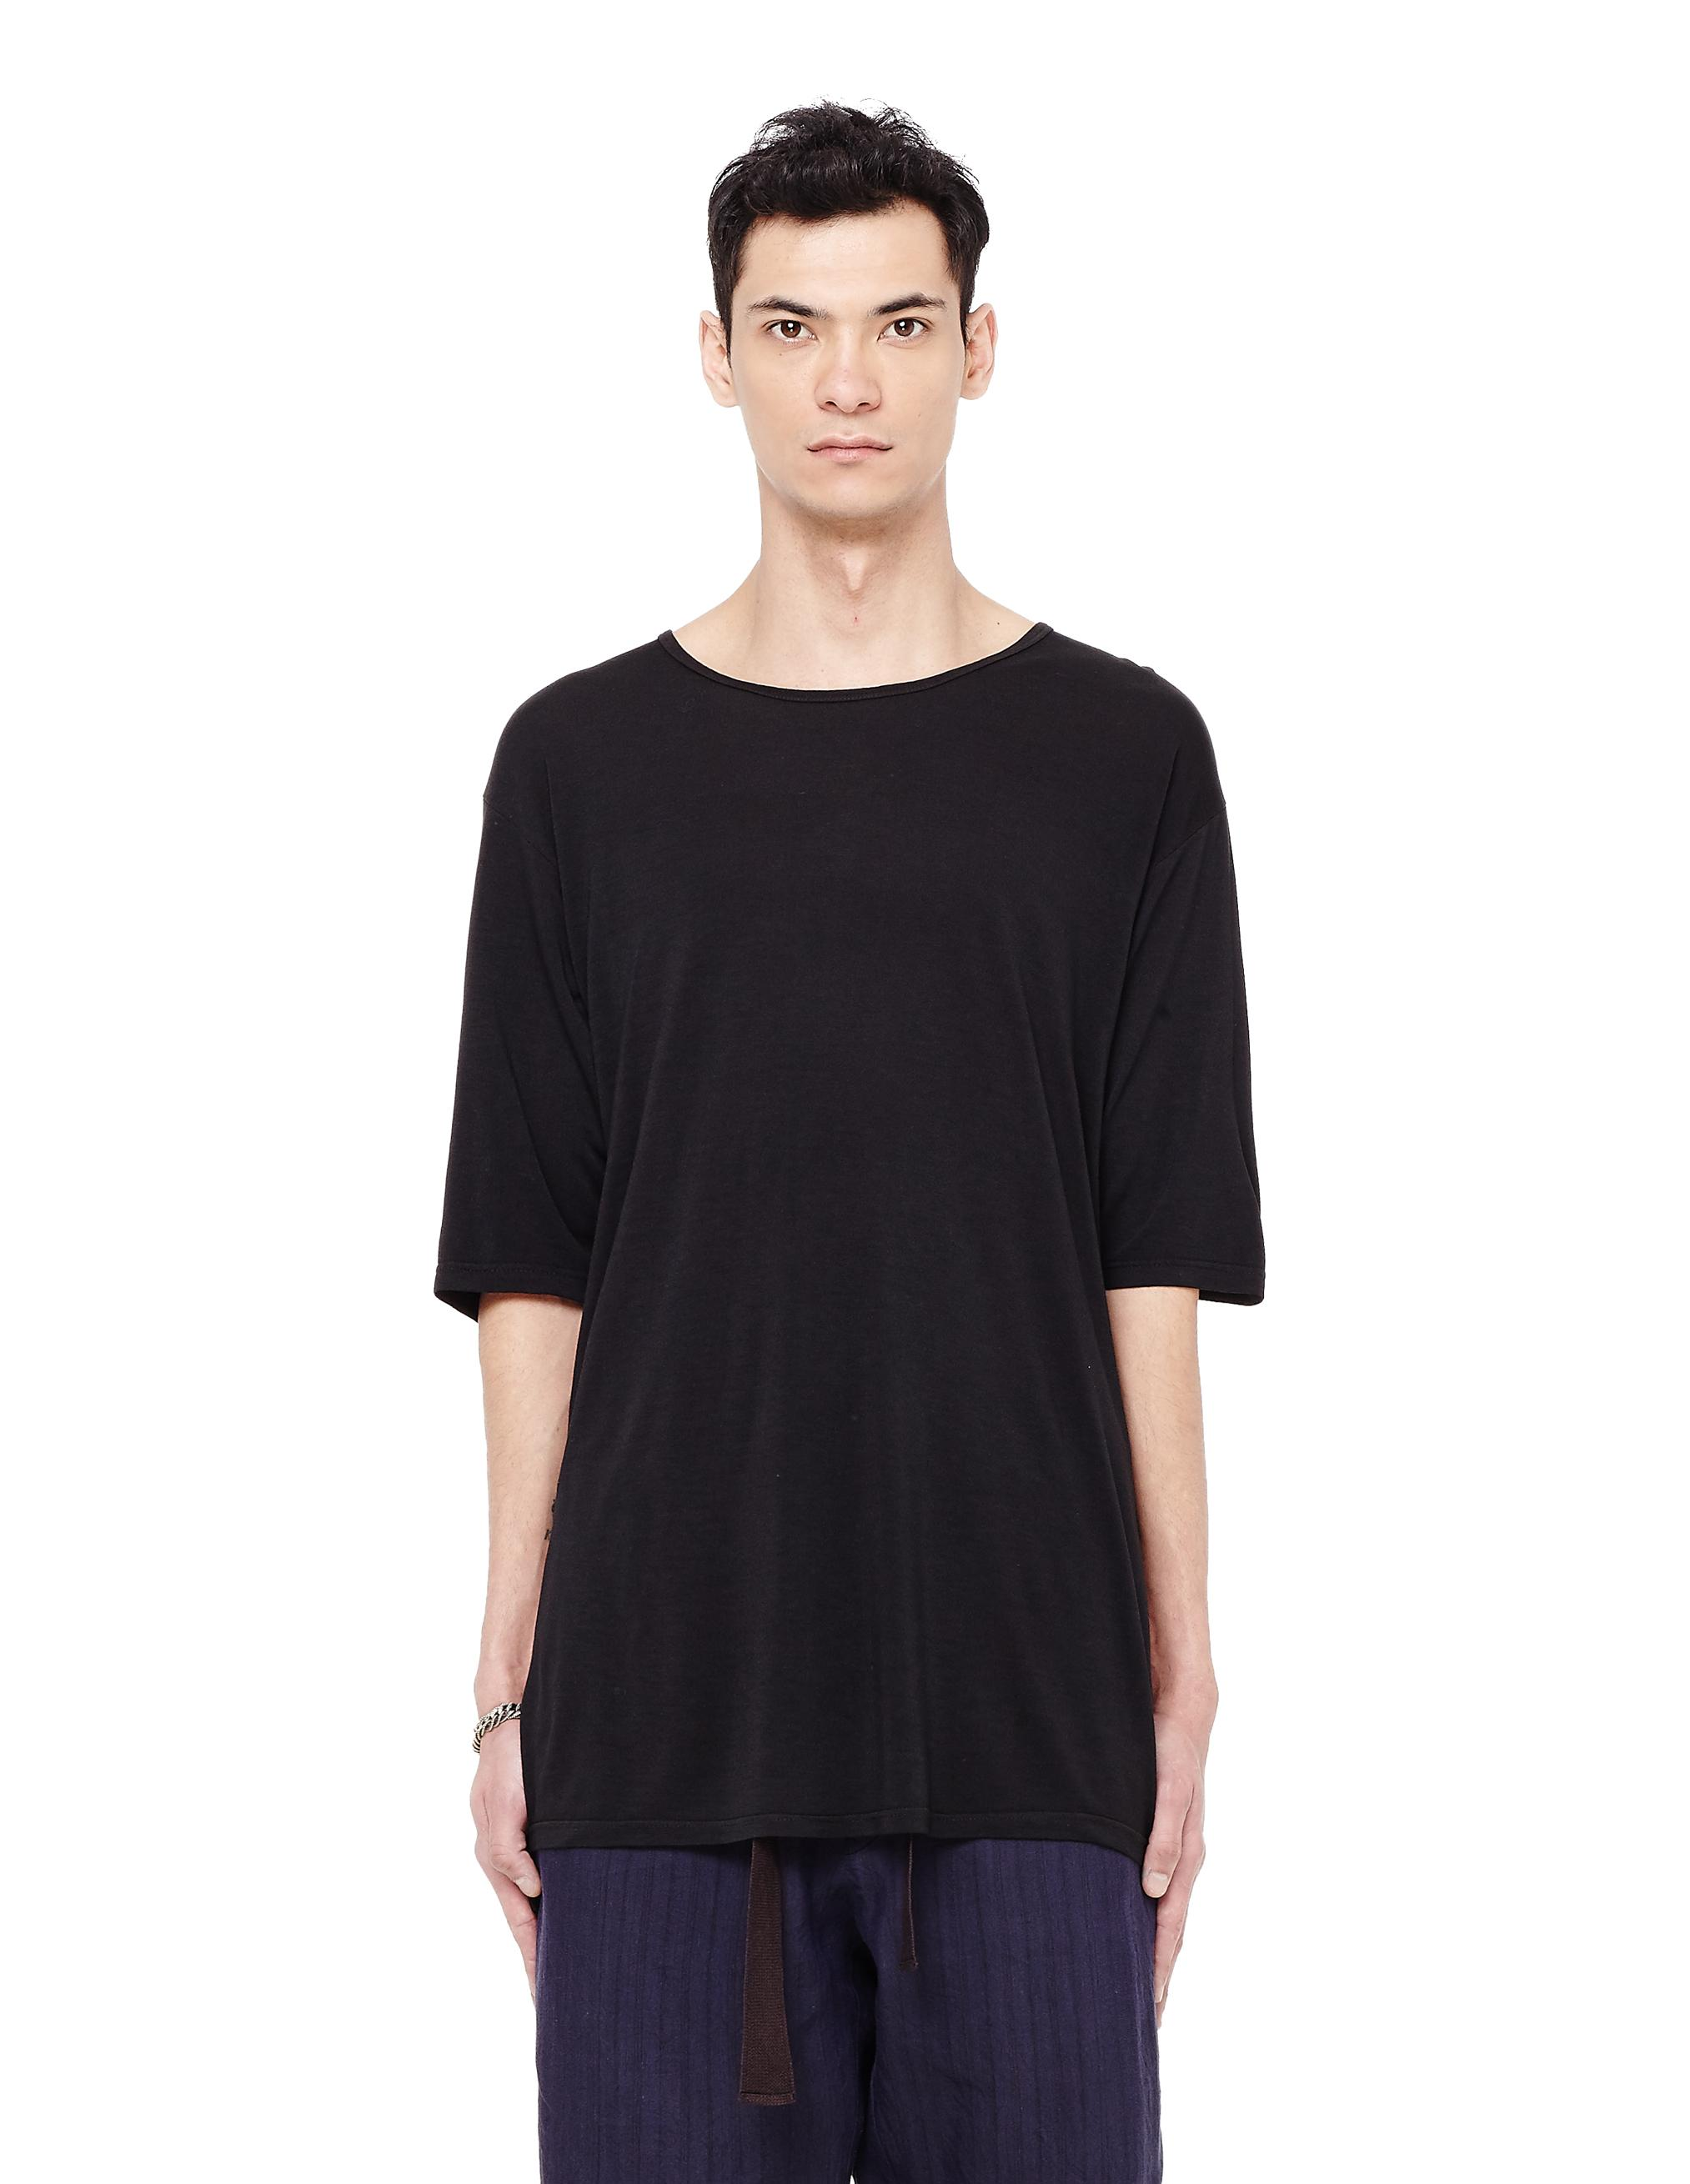 The Viridi-anne Modal Printed T-shirt In Black